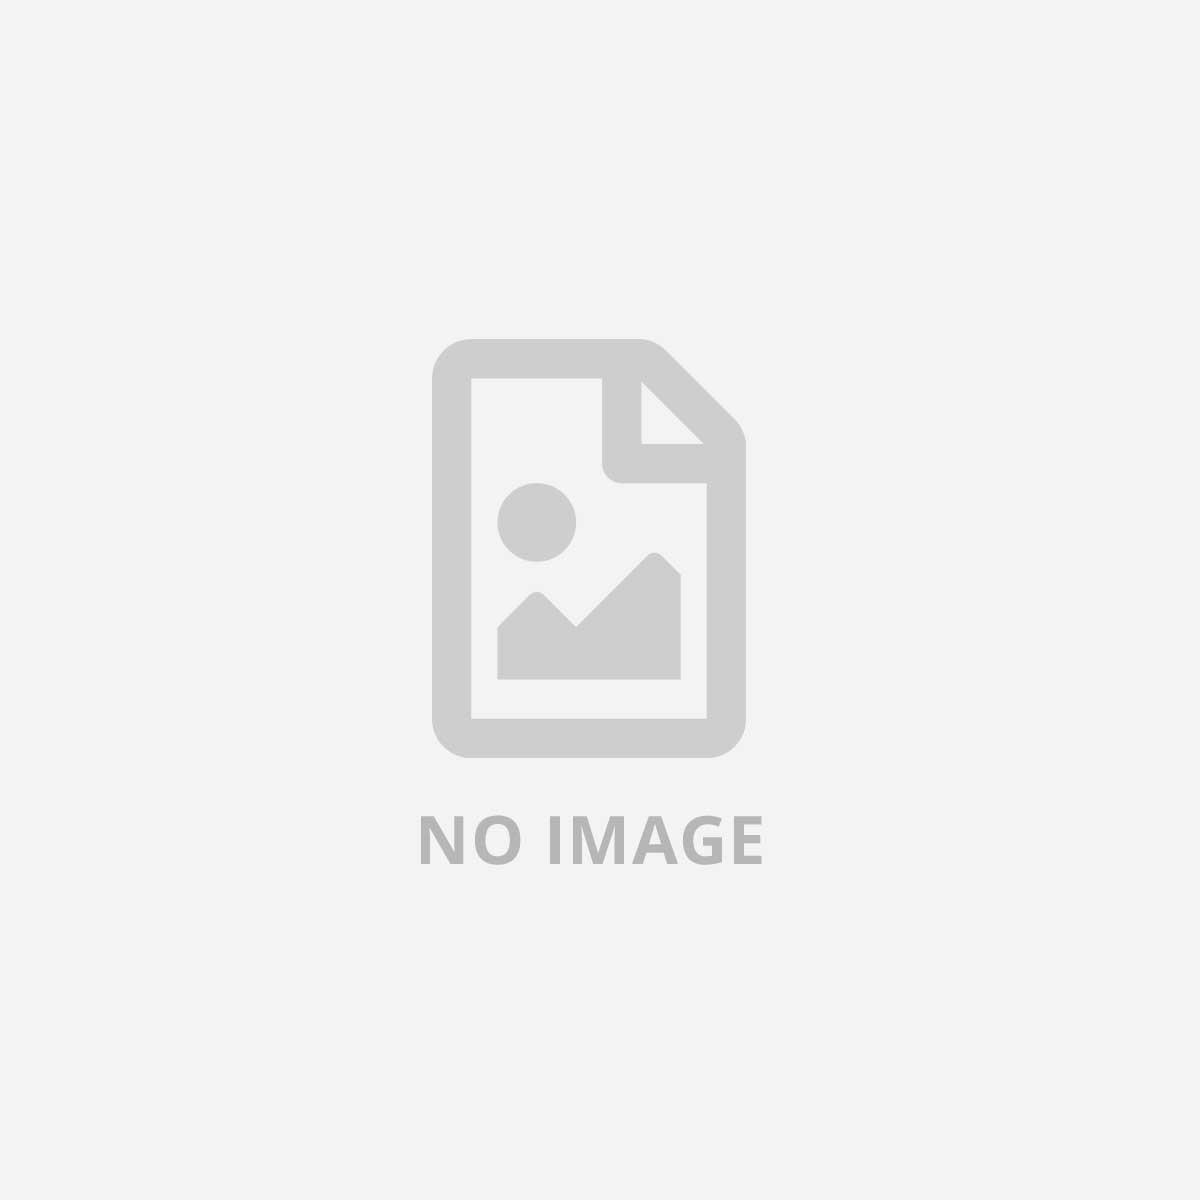 AEROHIVE NETWORKS RUBBR FEET AP130AP200 SERIES AP550